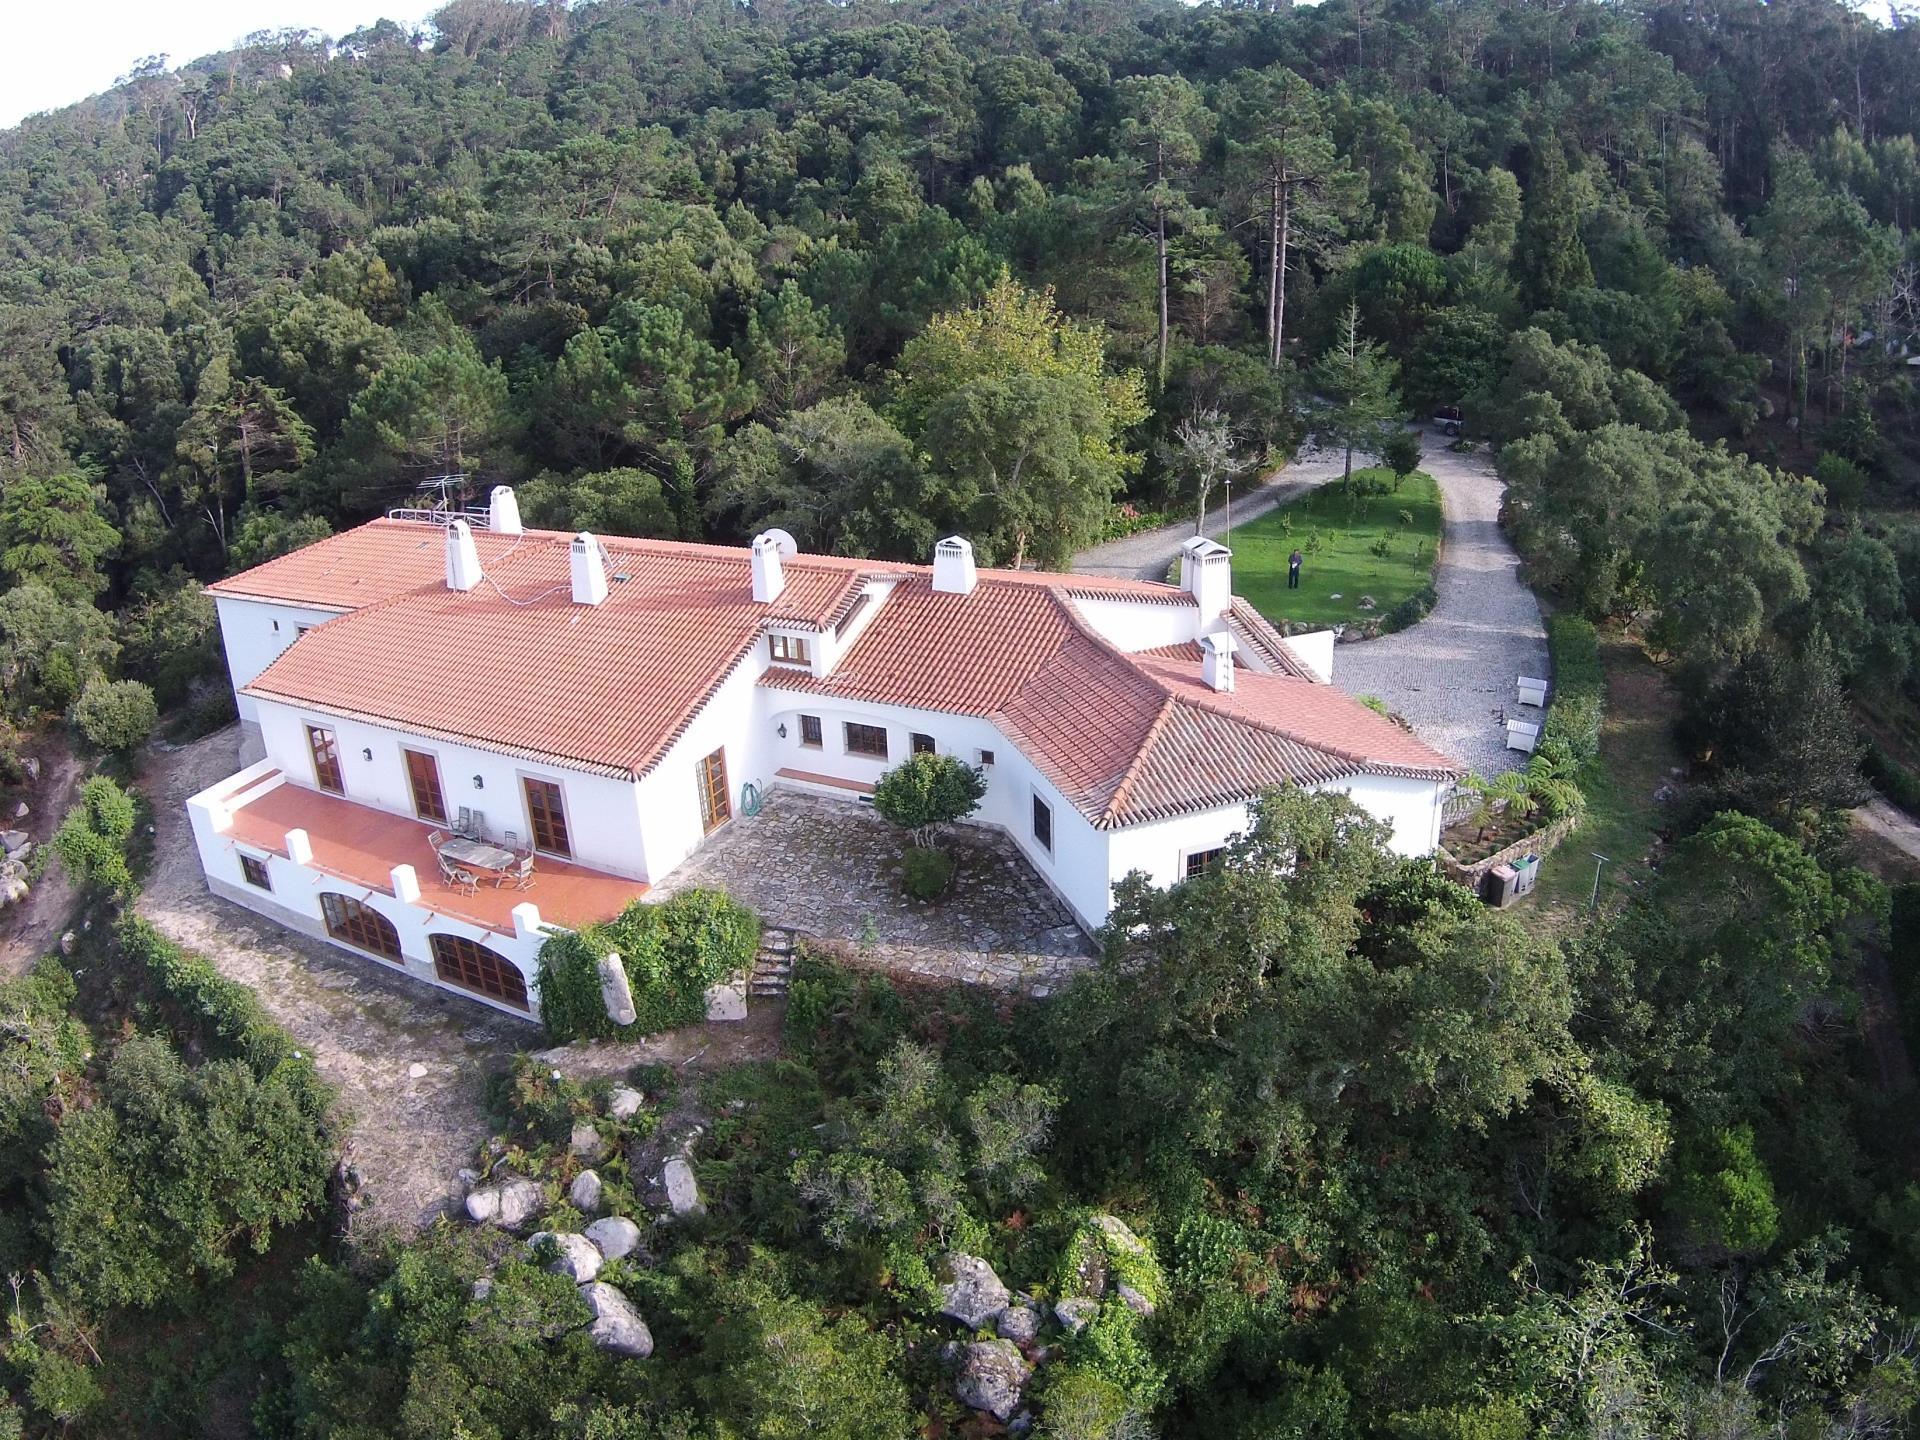 Farm / Ranch / Plantation for Sale at Farm, 7 bedrooms, for Sale Sintra, Sintra, Lisboa Portugal